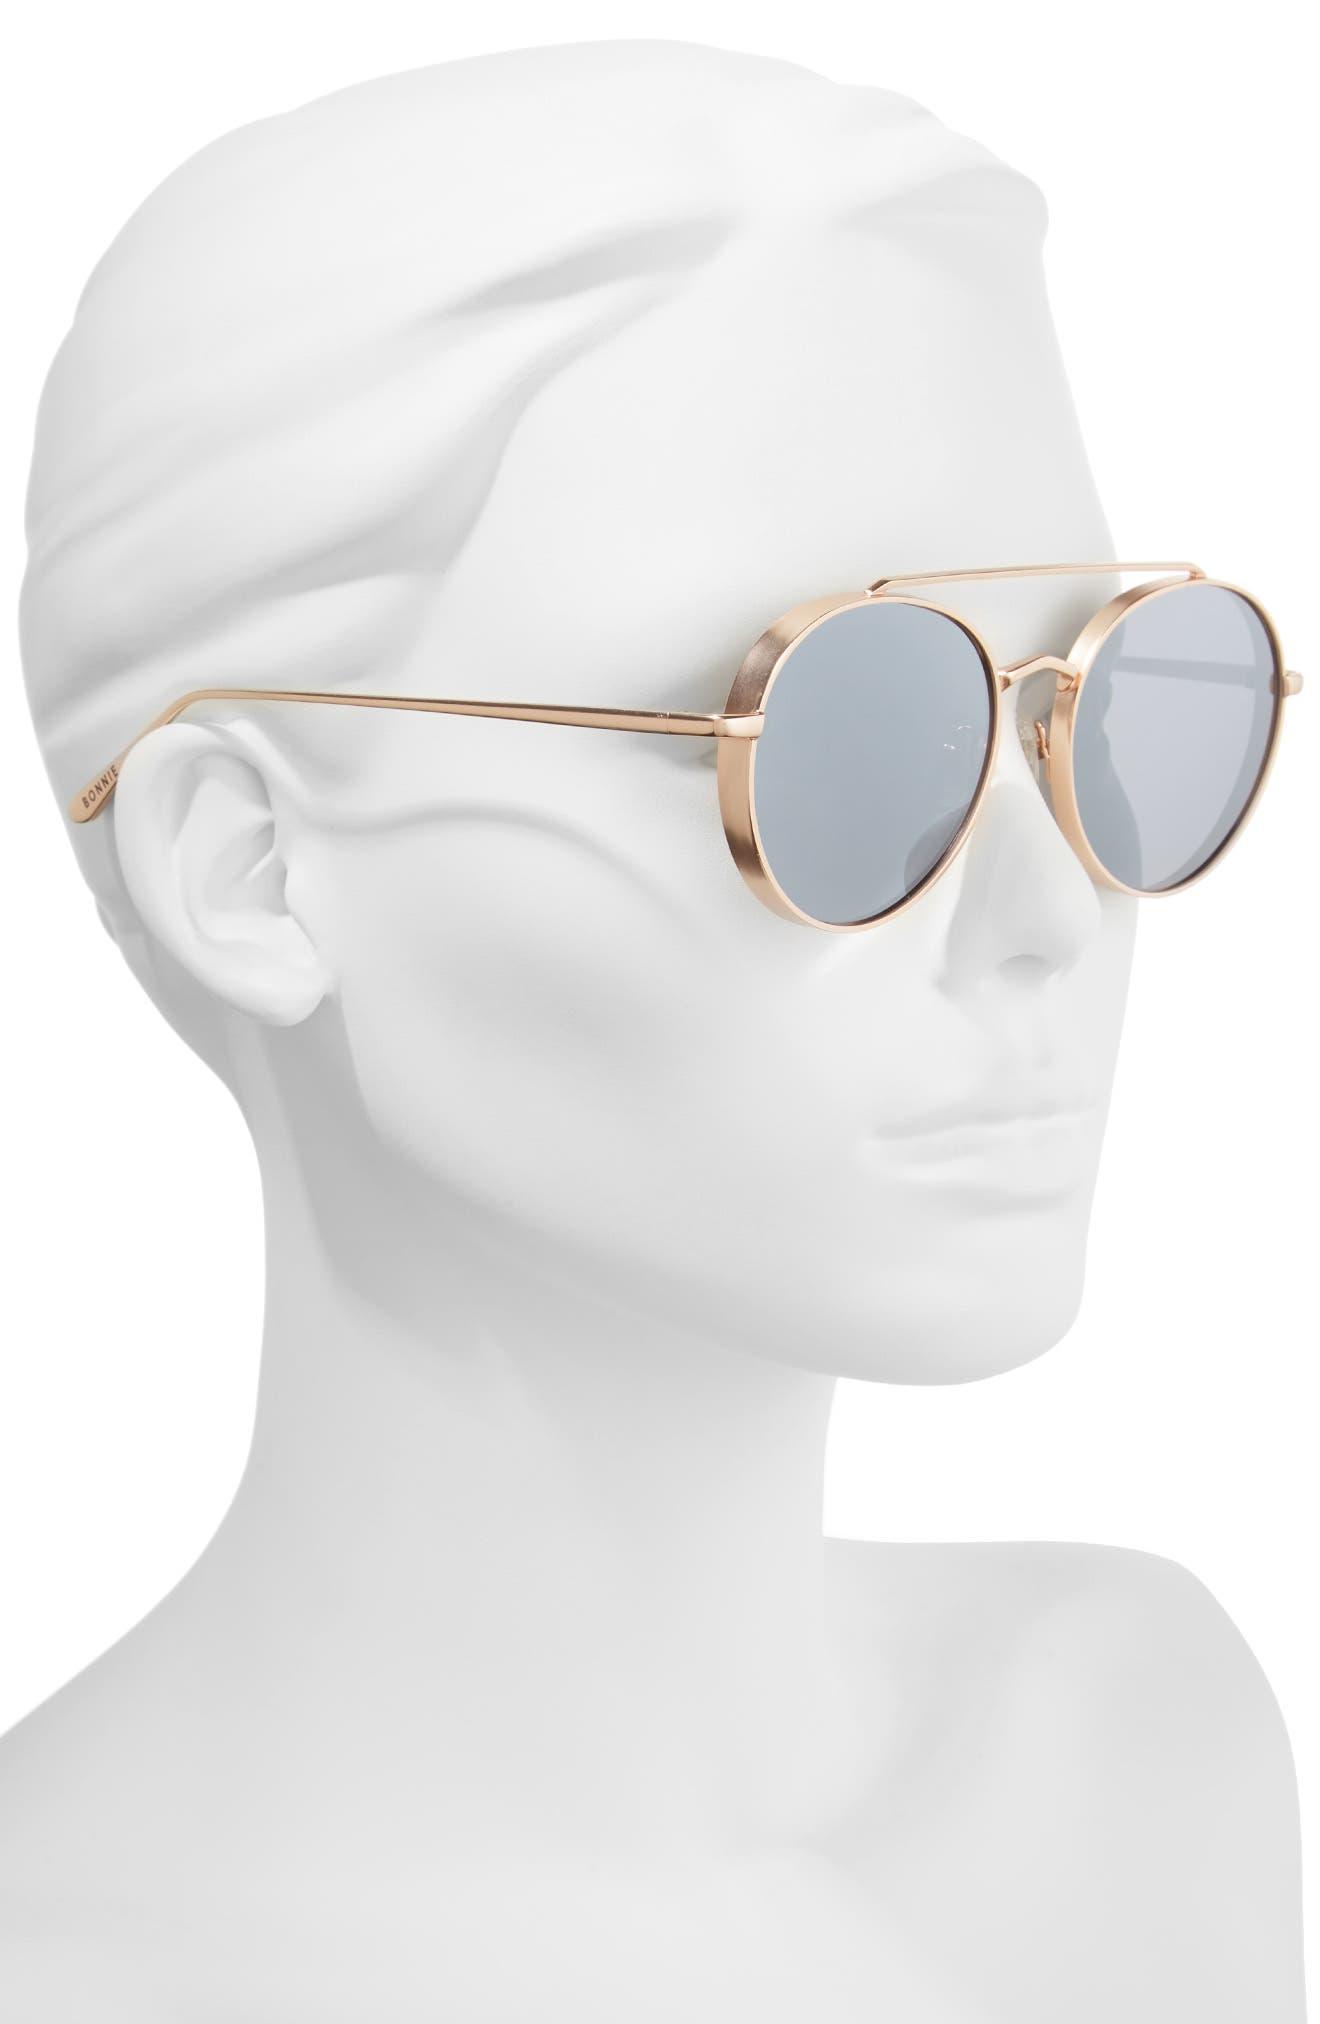 Olympic 53mm Polarized Aviator Sunglasses,                             Alternate thumbnail 4, color,                             Silver